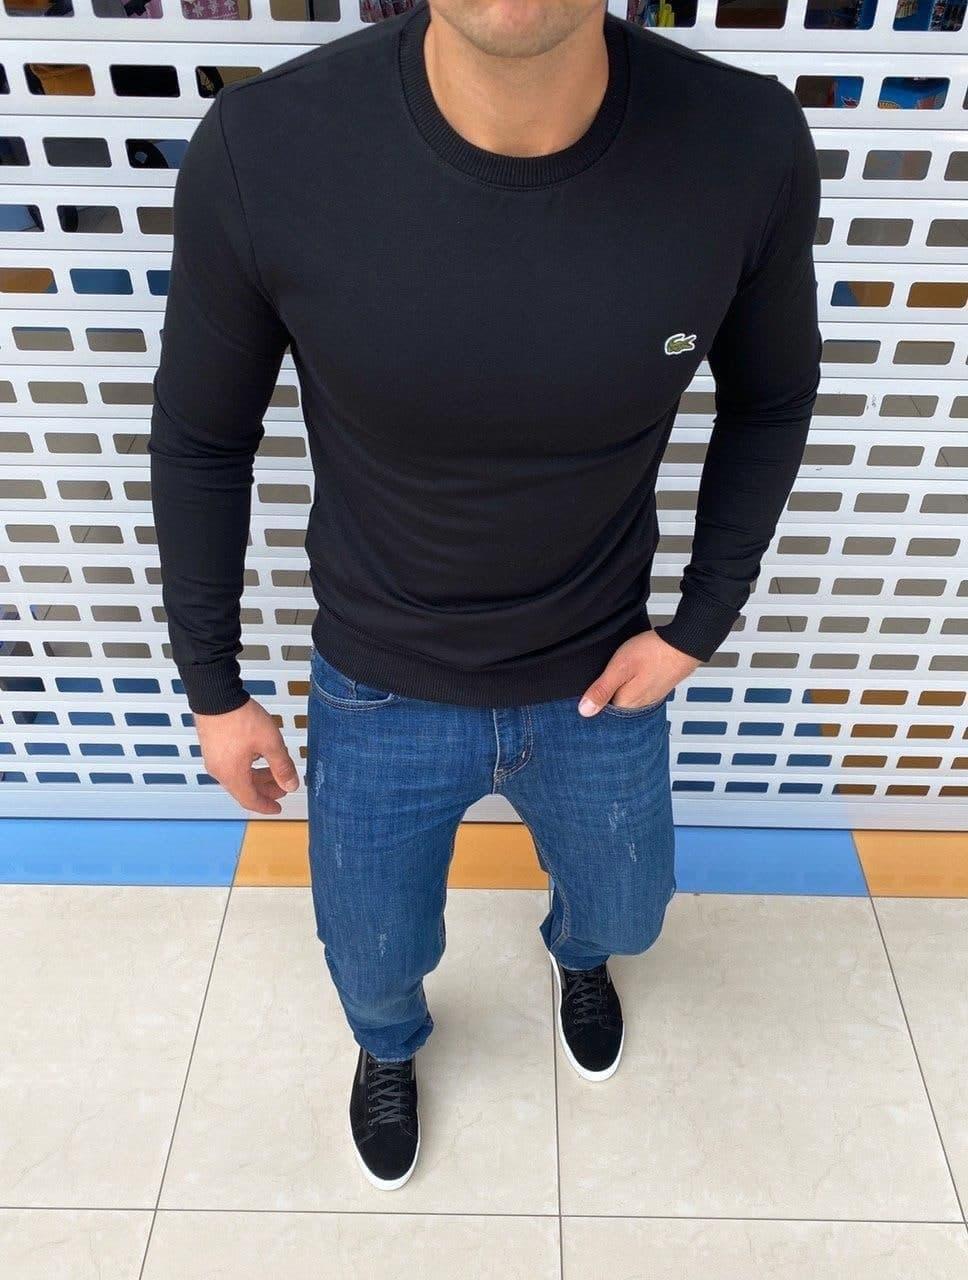 Мужская кофта свитшот Lacoste H1166 черная